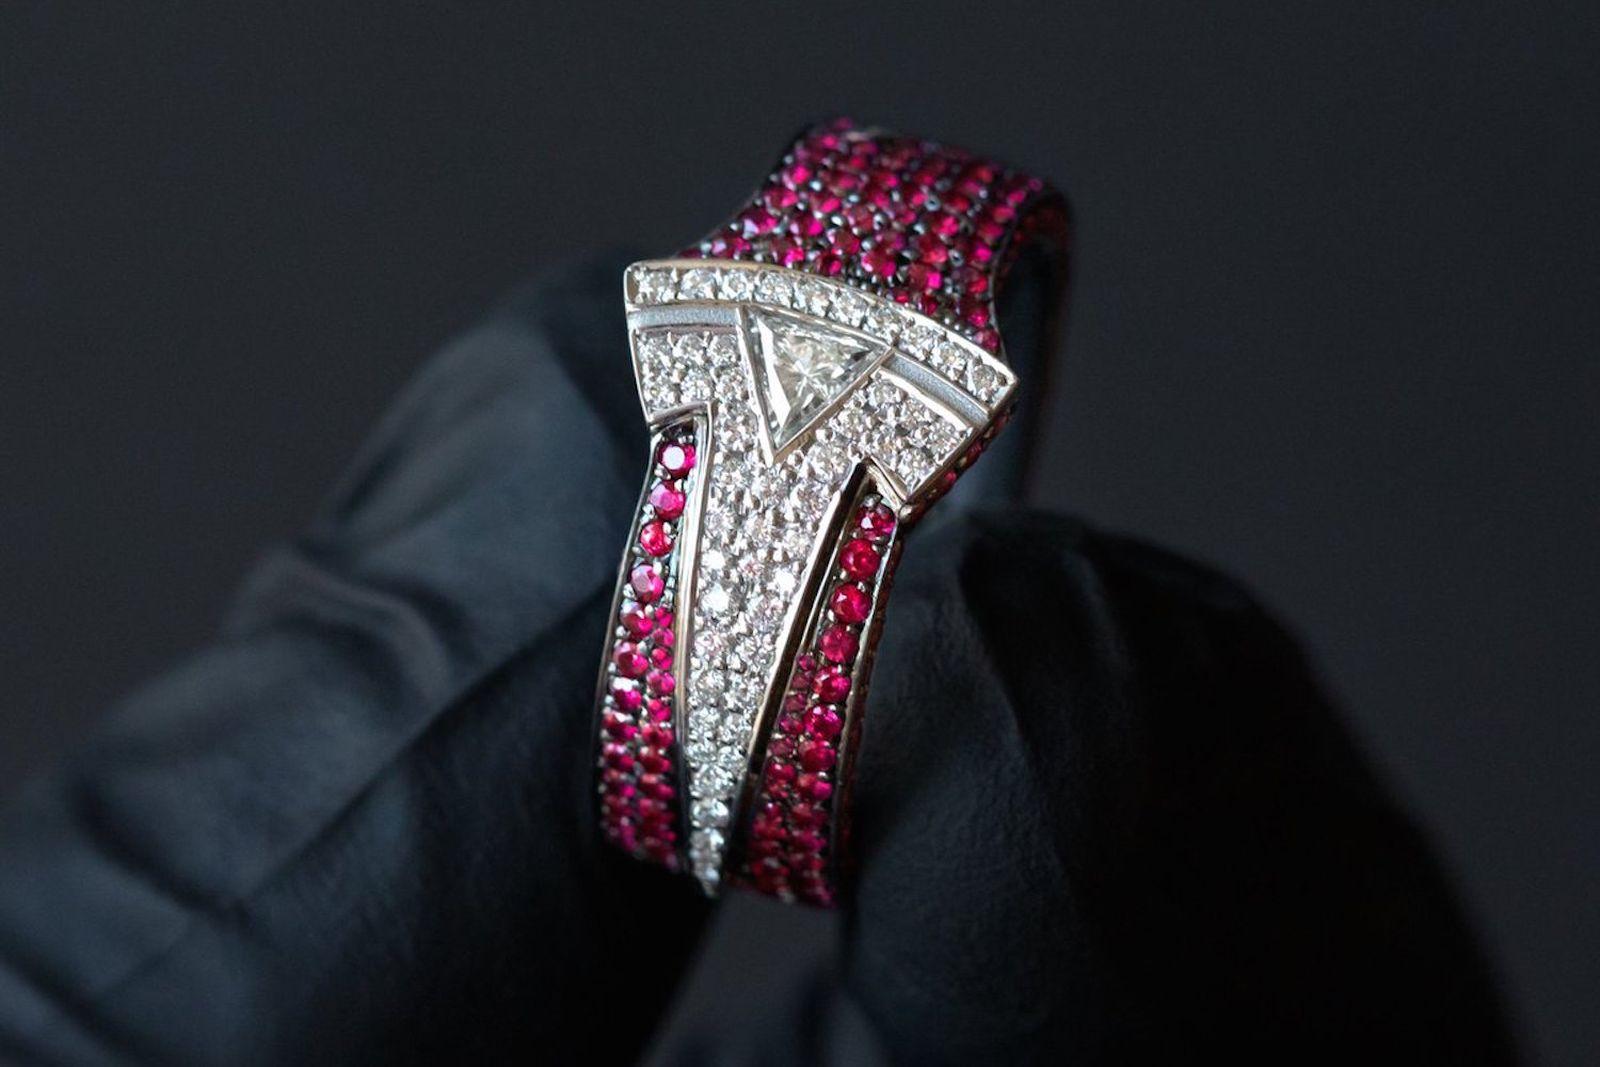 ben baller elon musk tesla diamond ring